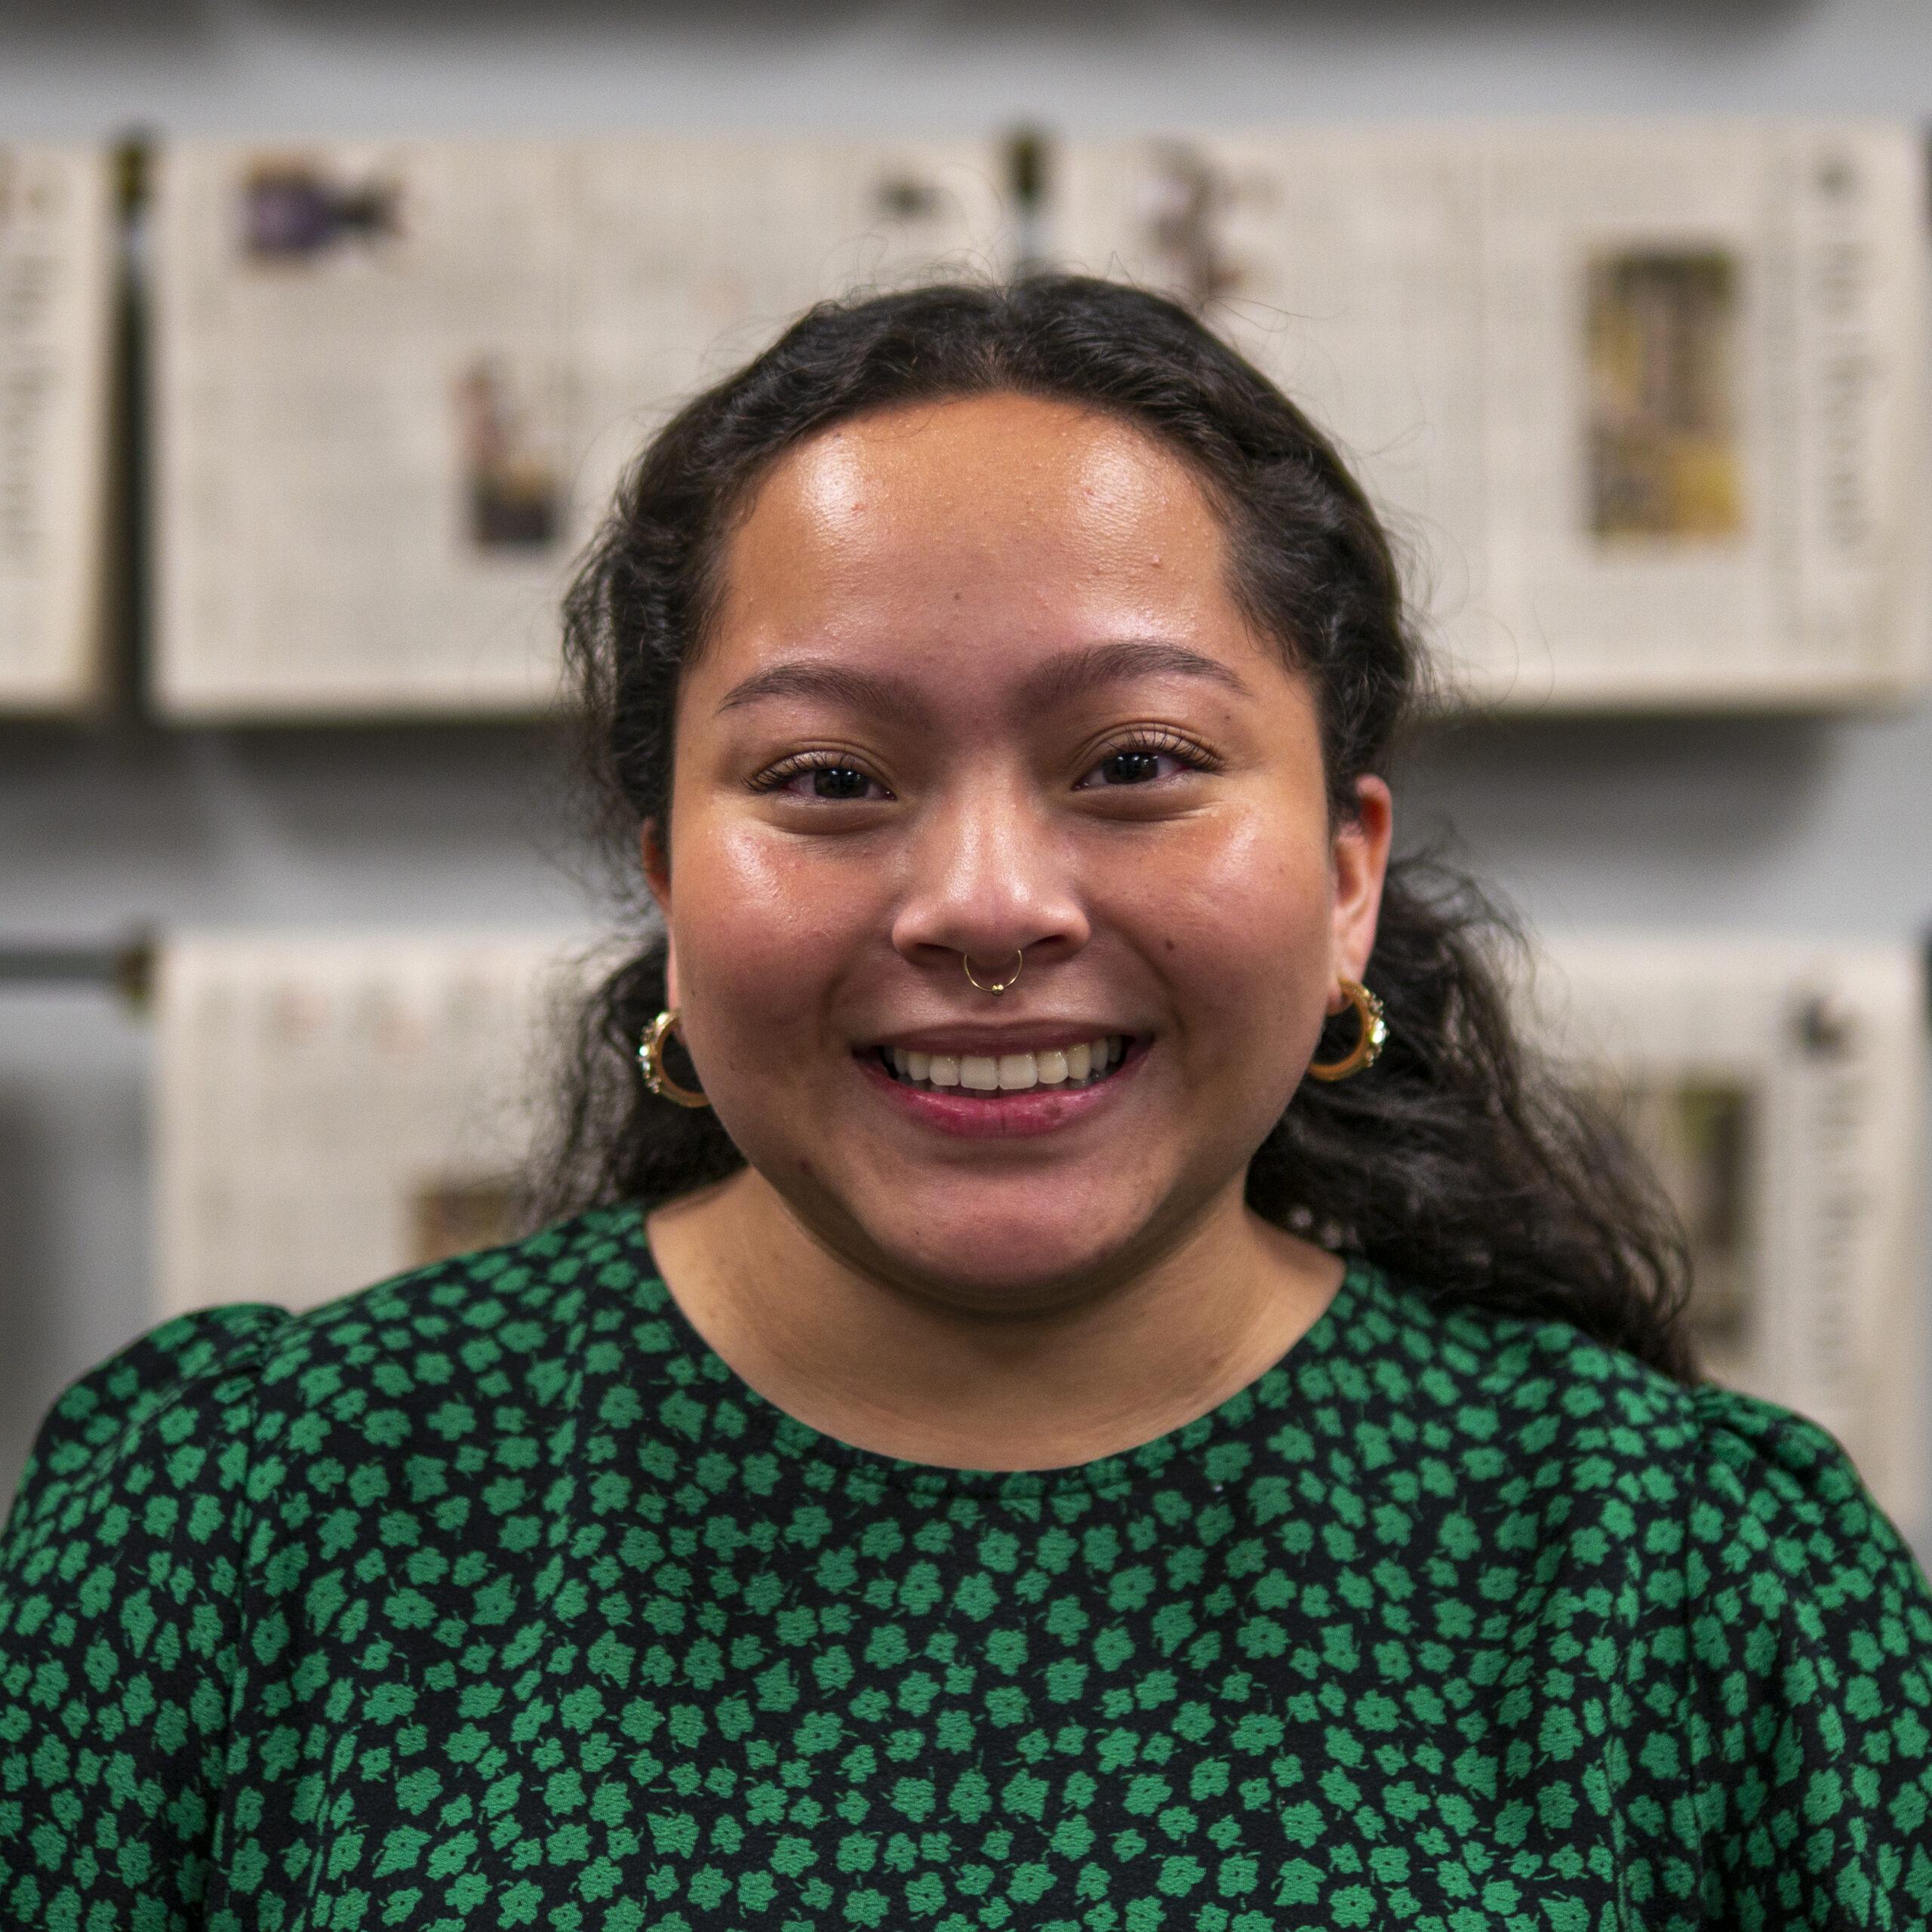 Portrait of Mariela Esparza